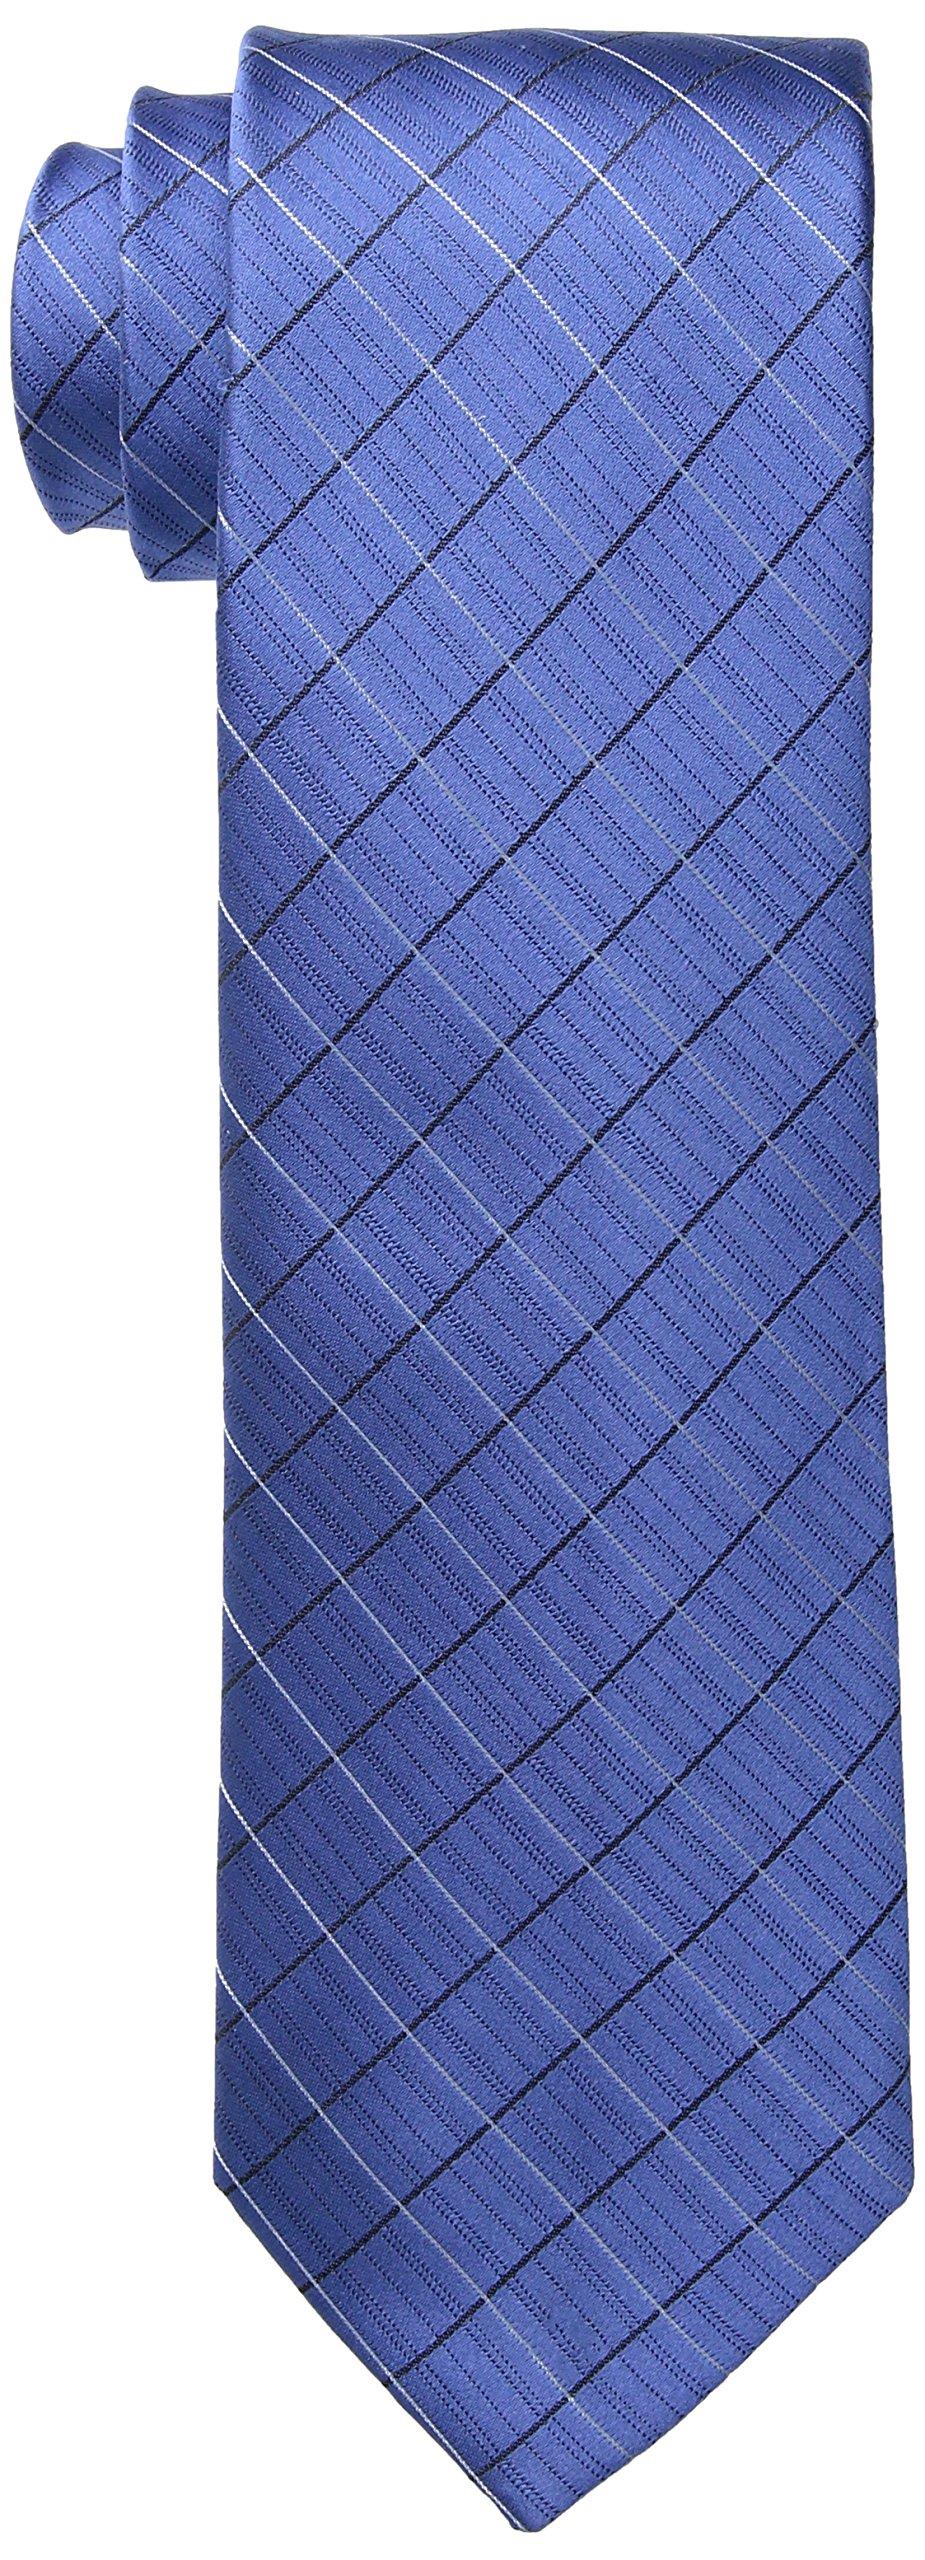 Calvin Klein Men's Etched Windowpane B Tie, Slate, Regular